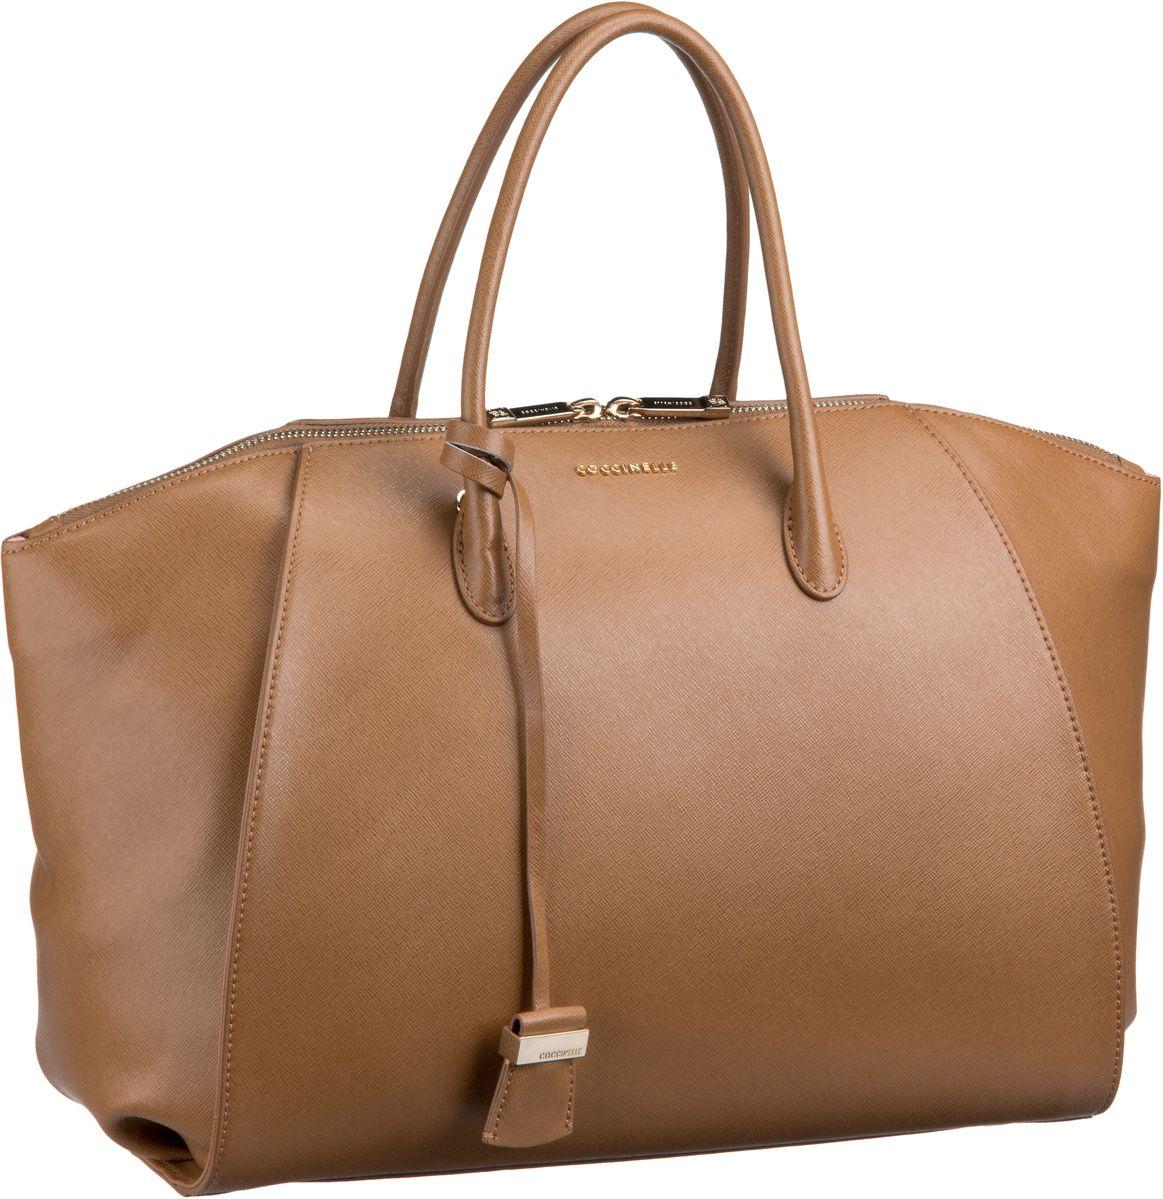 Lou 1801 Cuoio (innen: Rosa) Handtasche